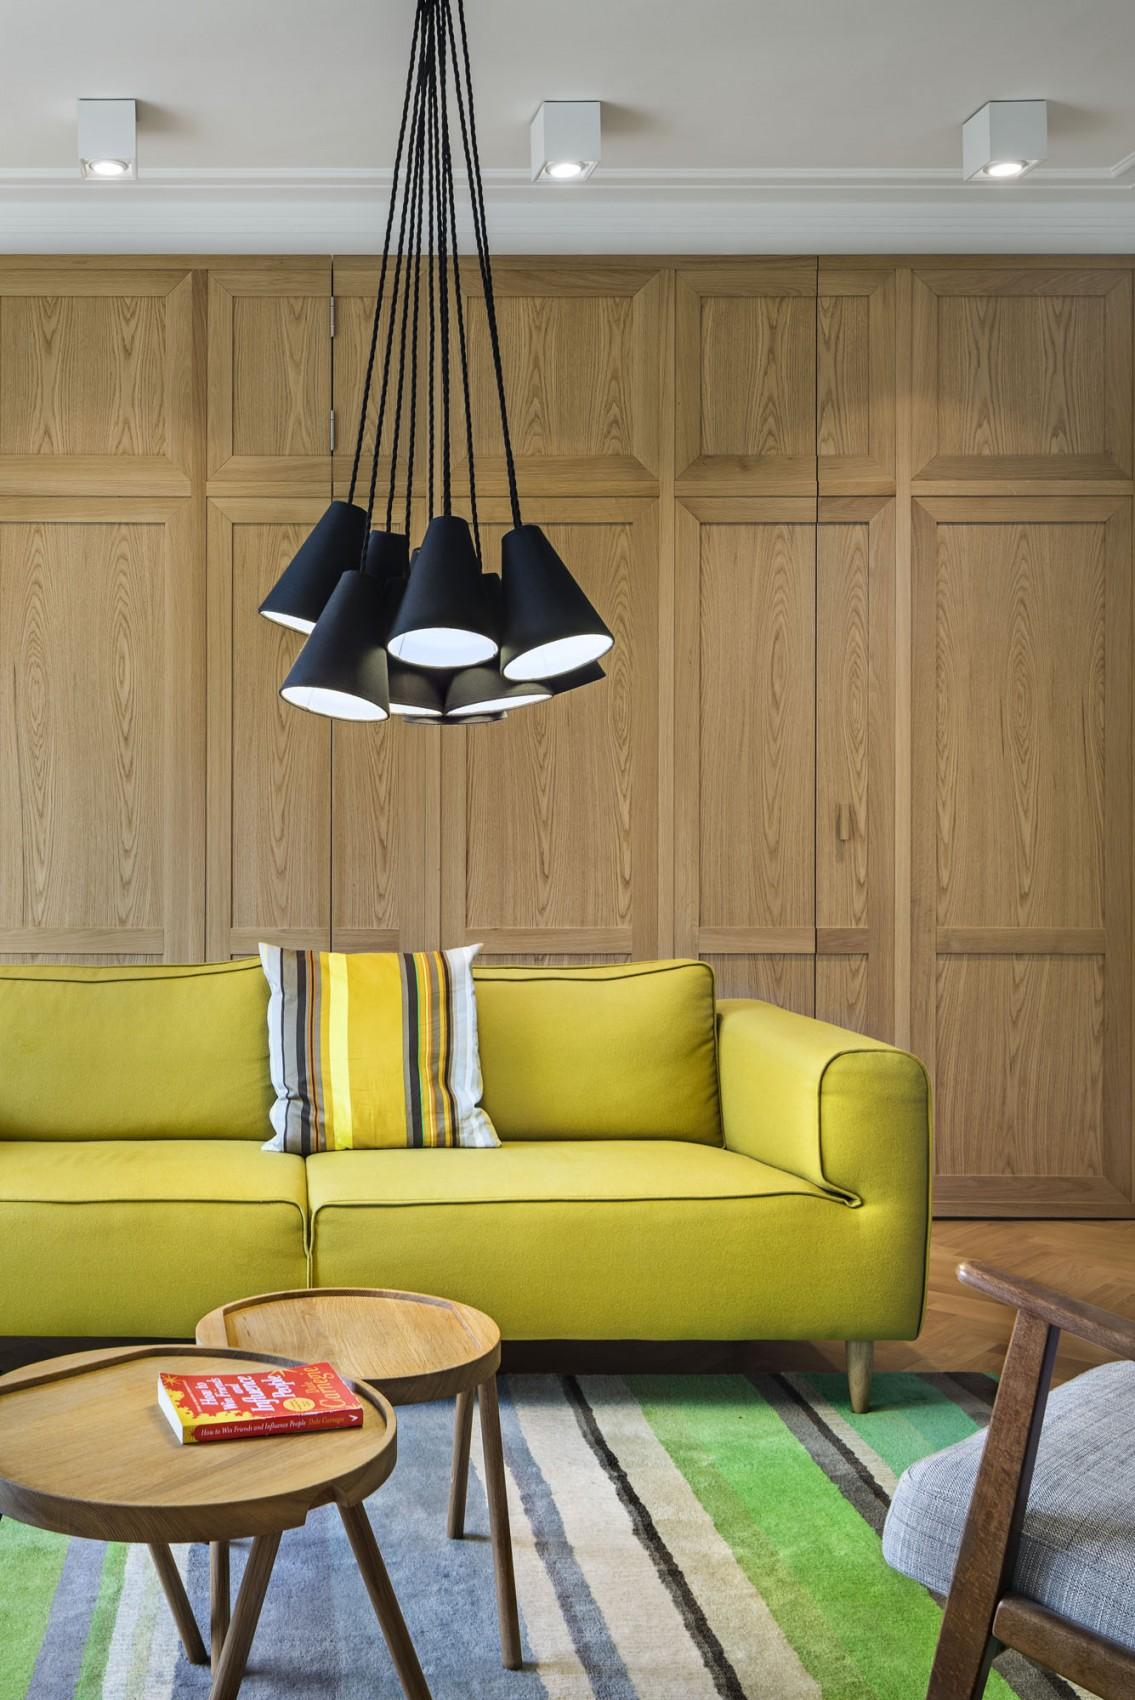 Apartment H01 sofa and area rug